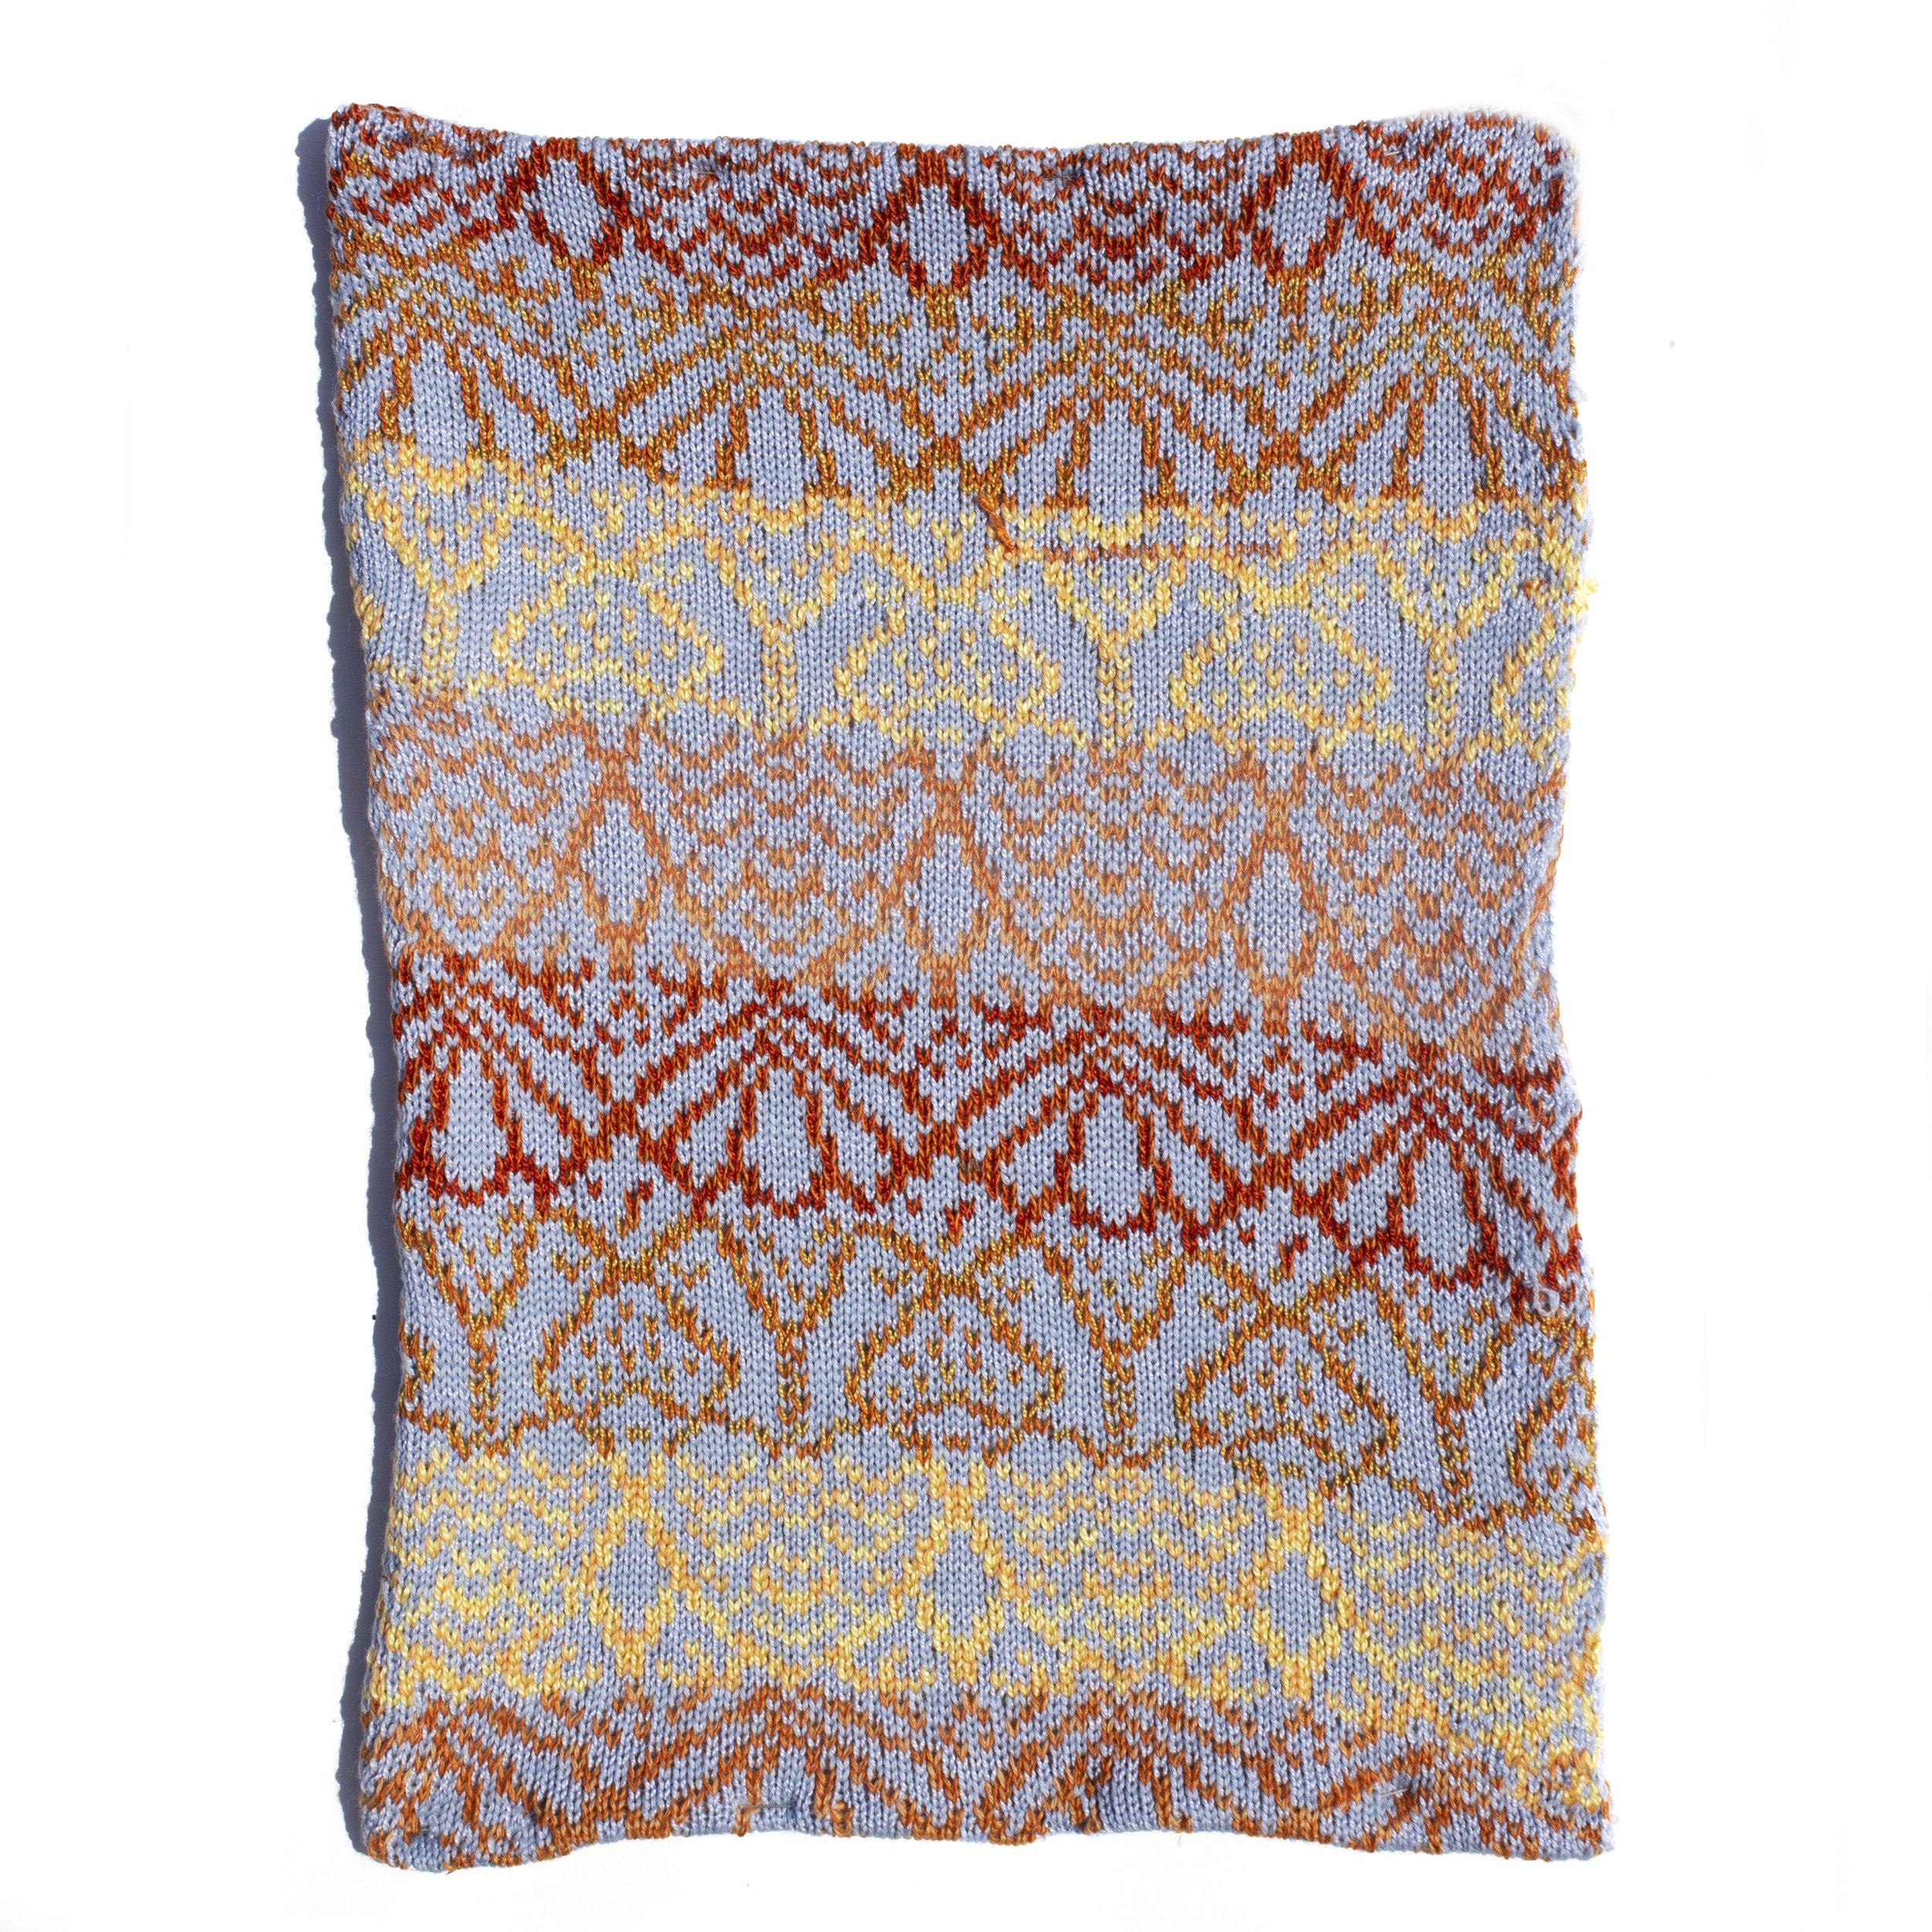 knit7.0.jpg